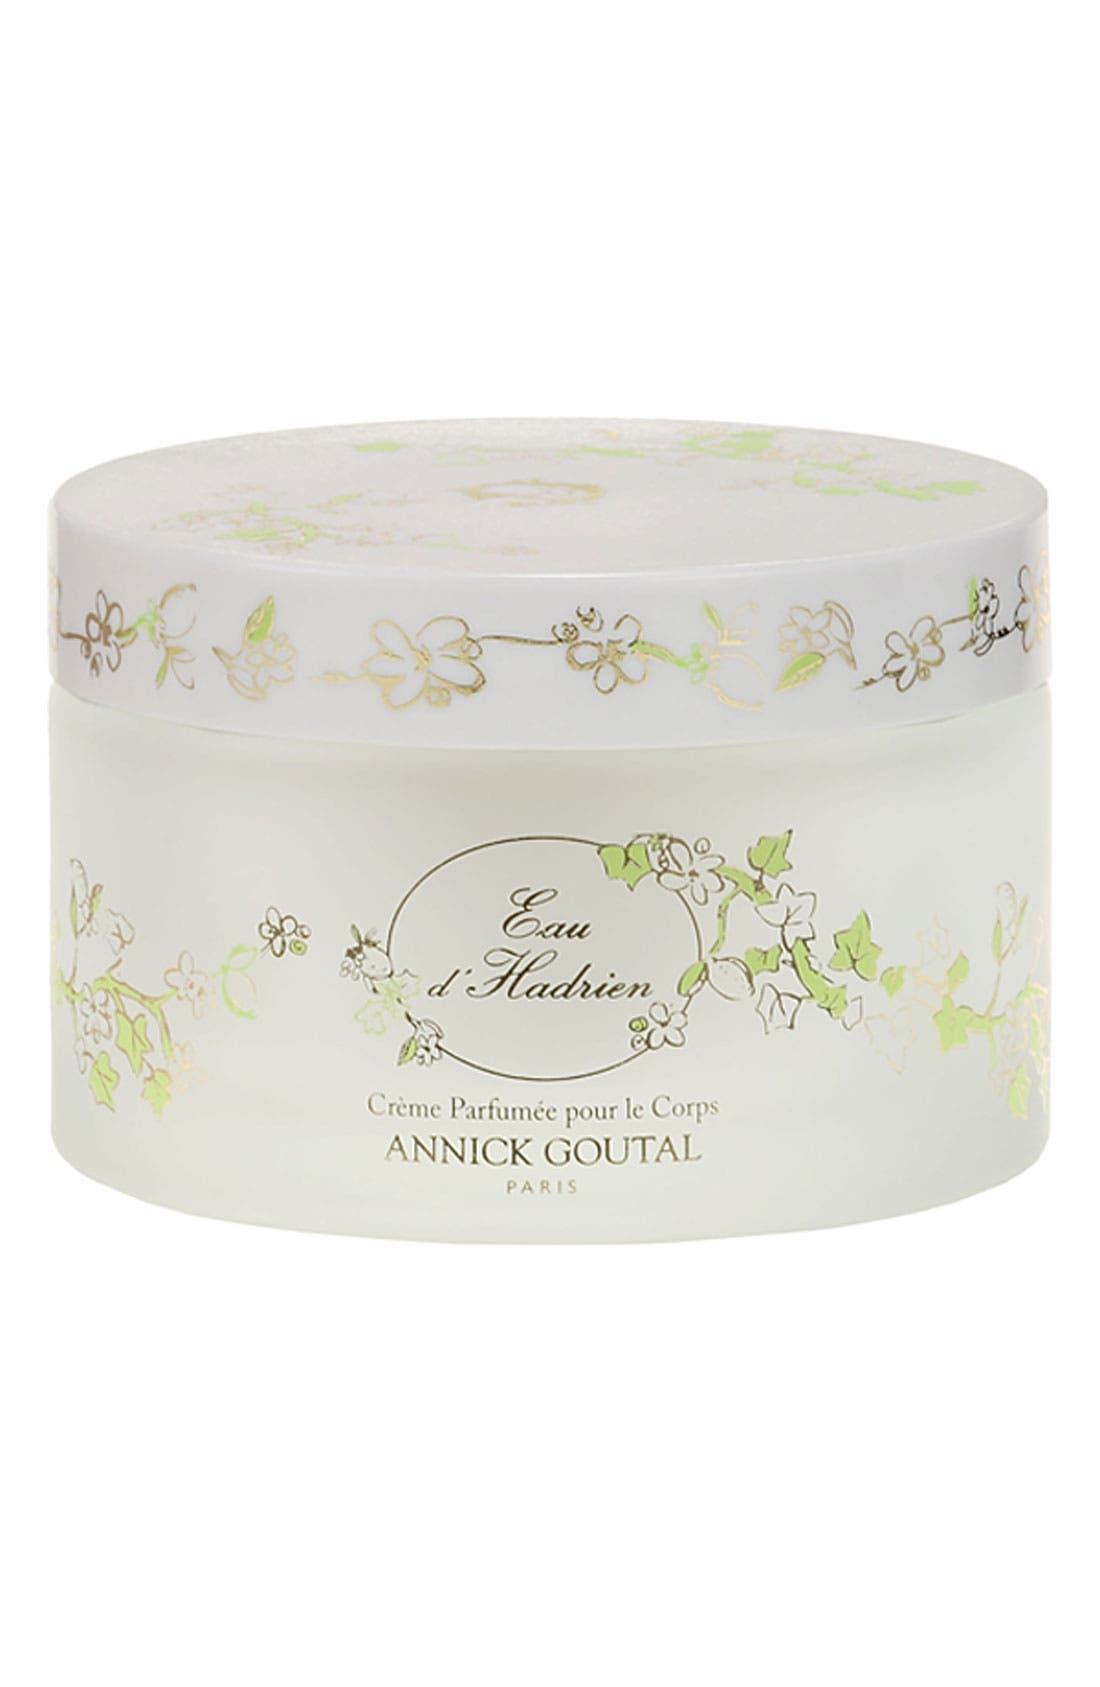 ANNICK GOUTAL 'Eau d'Hadrien' Body Cream, Main, color, 000